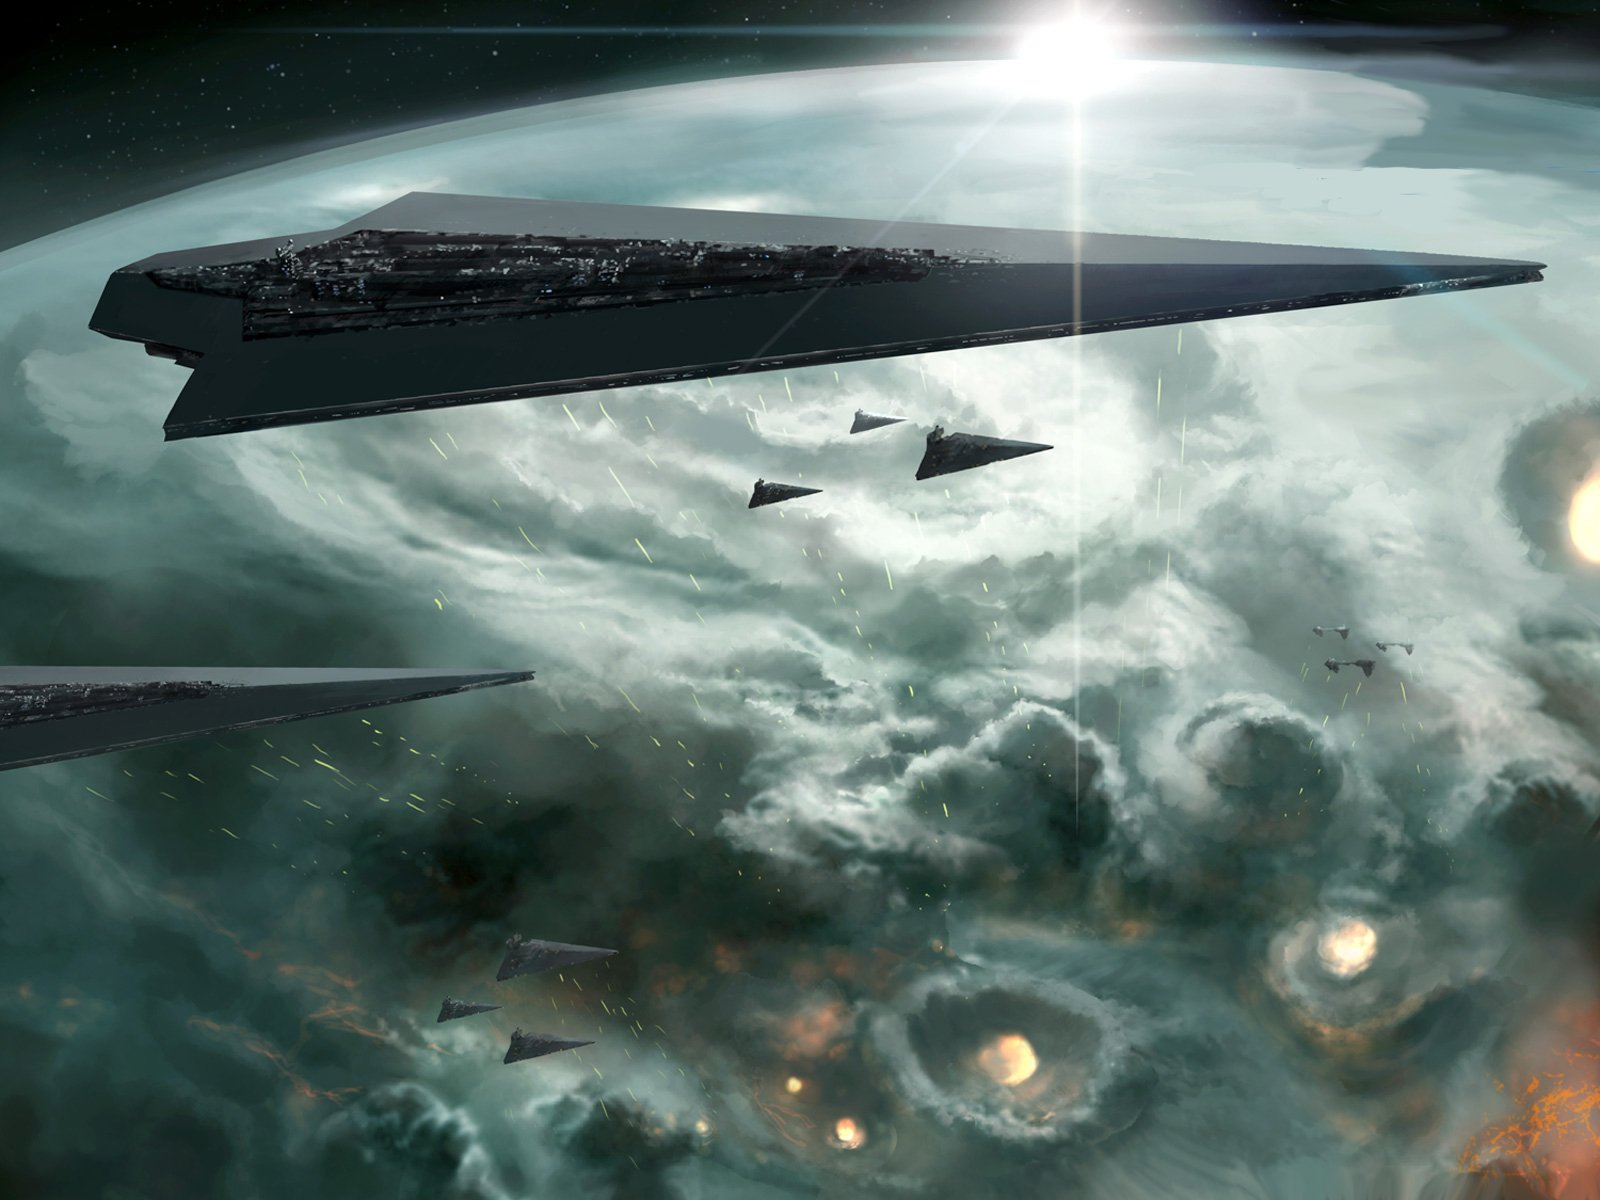 Star Wars Venator Wallpaper Posted By Samantha Mercado